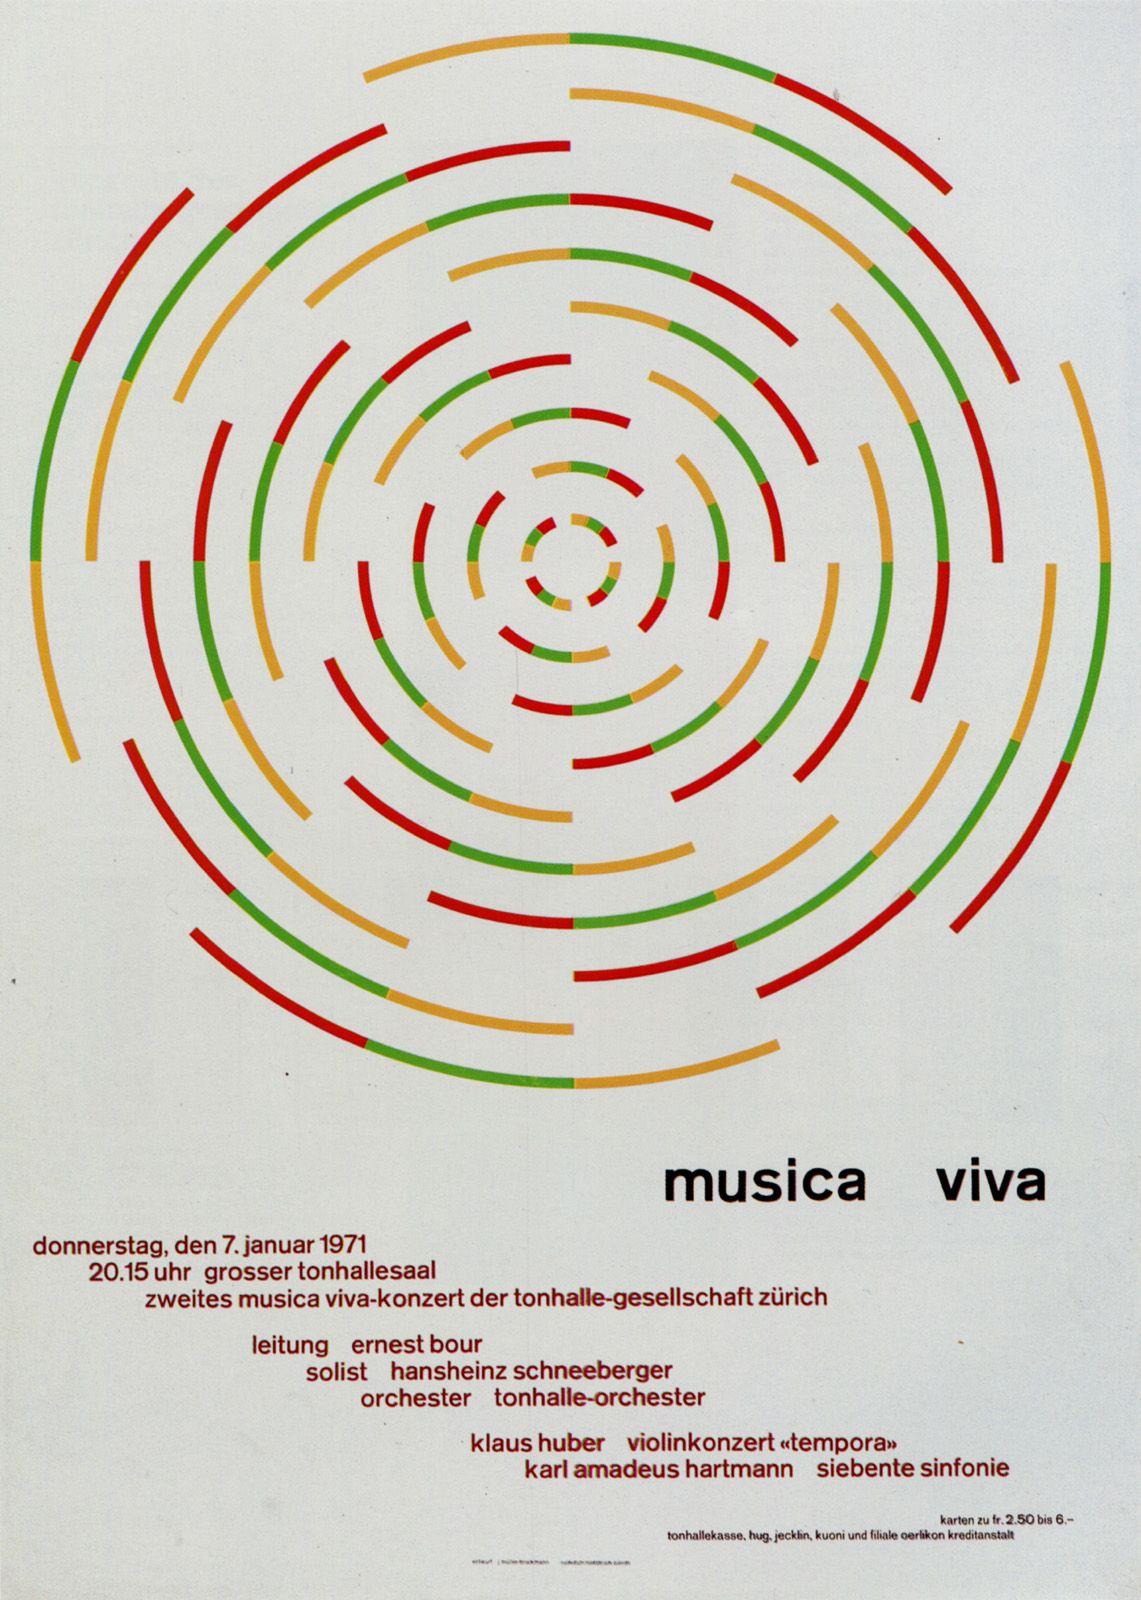 Josef Müller-Brockmann | Graphic & Illustration | Pinterest | Musica ...